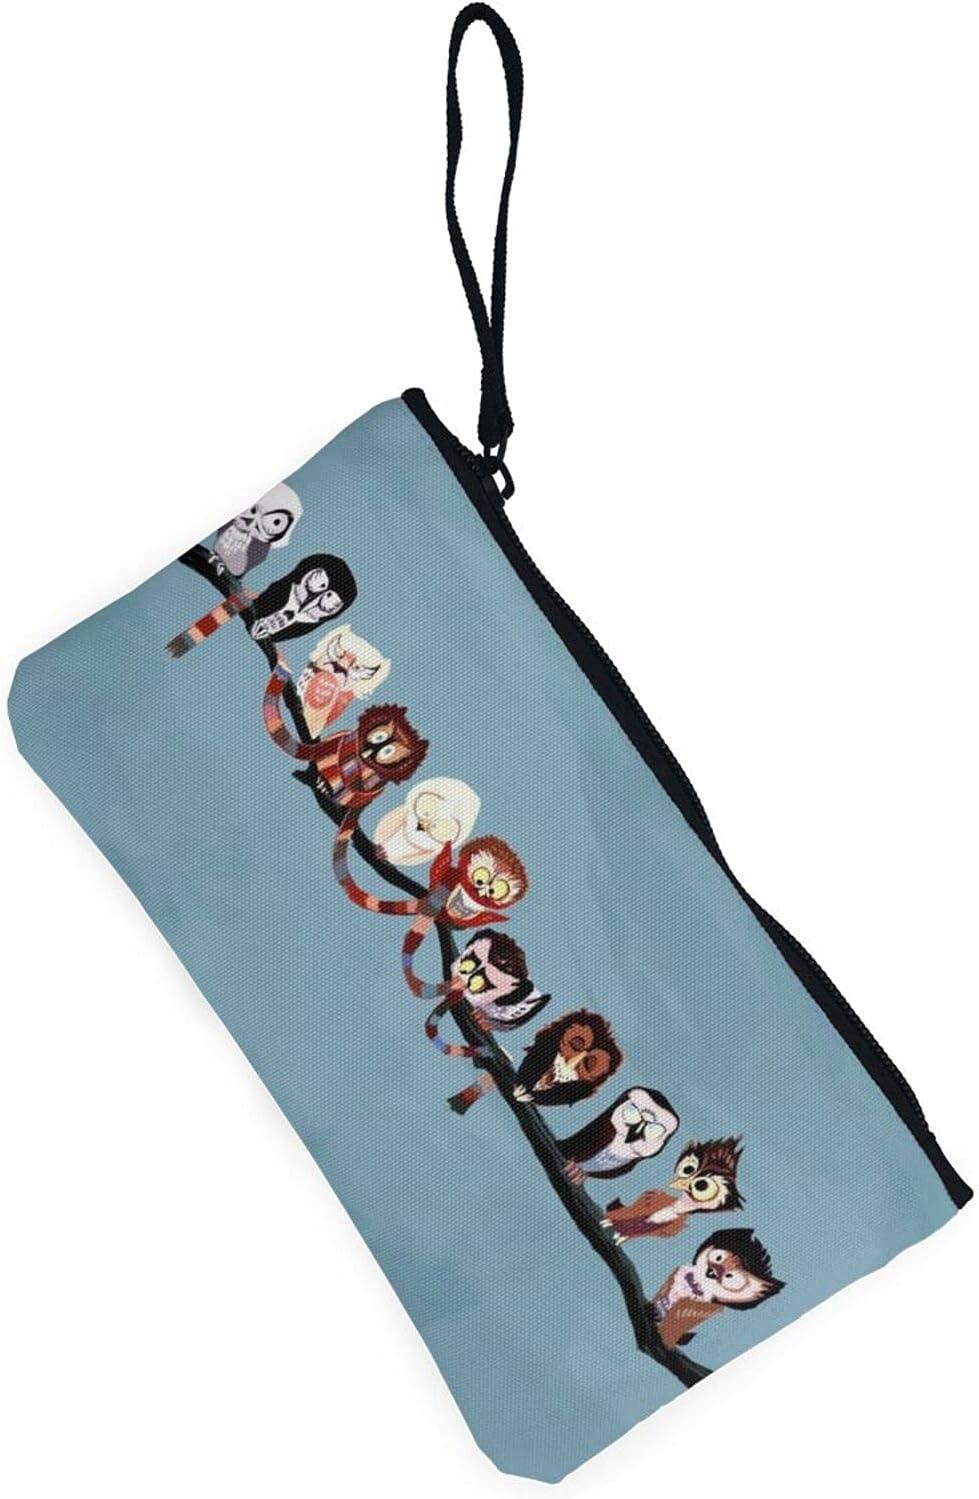 AORRUAM Animal funnyanimals Canvas Coin Purse,Canvas Zipper Pencil Cases,Canvas Change Purse Pouch Mini Wallet Coin Bag